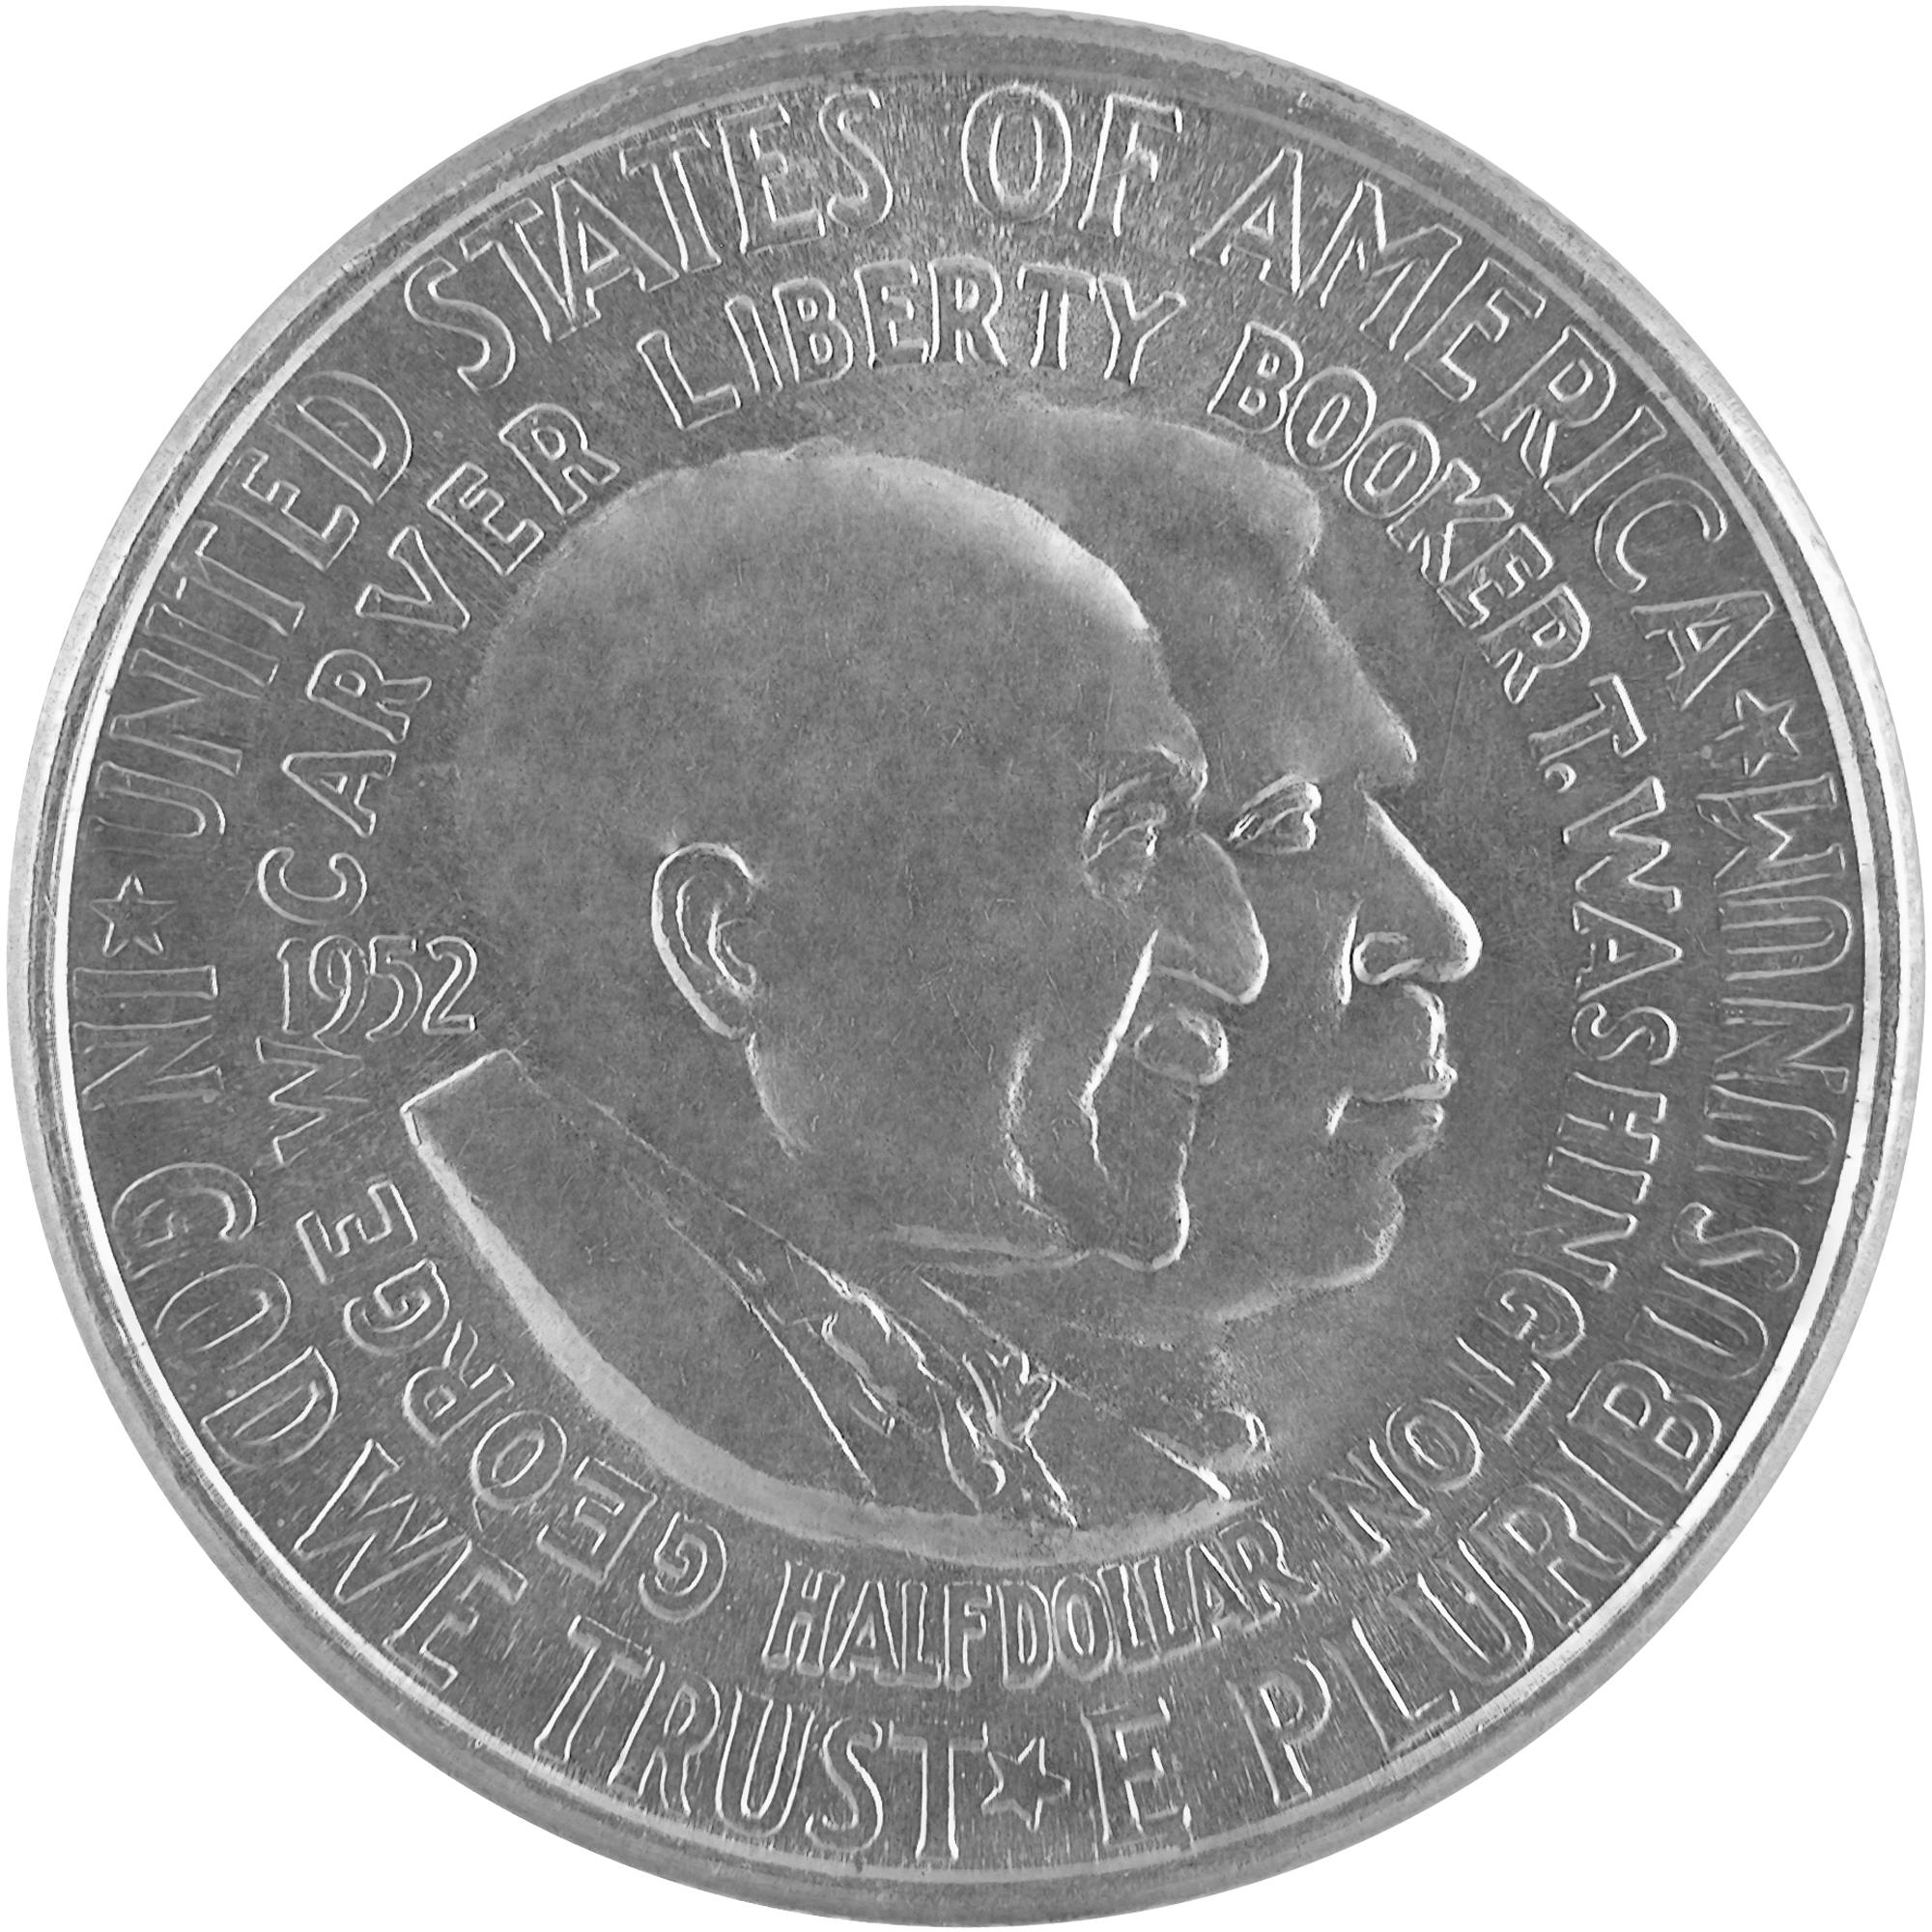 1952 George W. Carver Booker T. Washington Commemorative Silver Half Dollar Coin Obverse